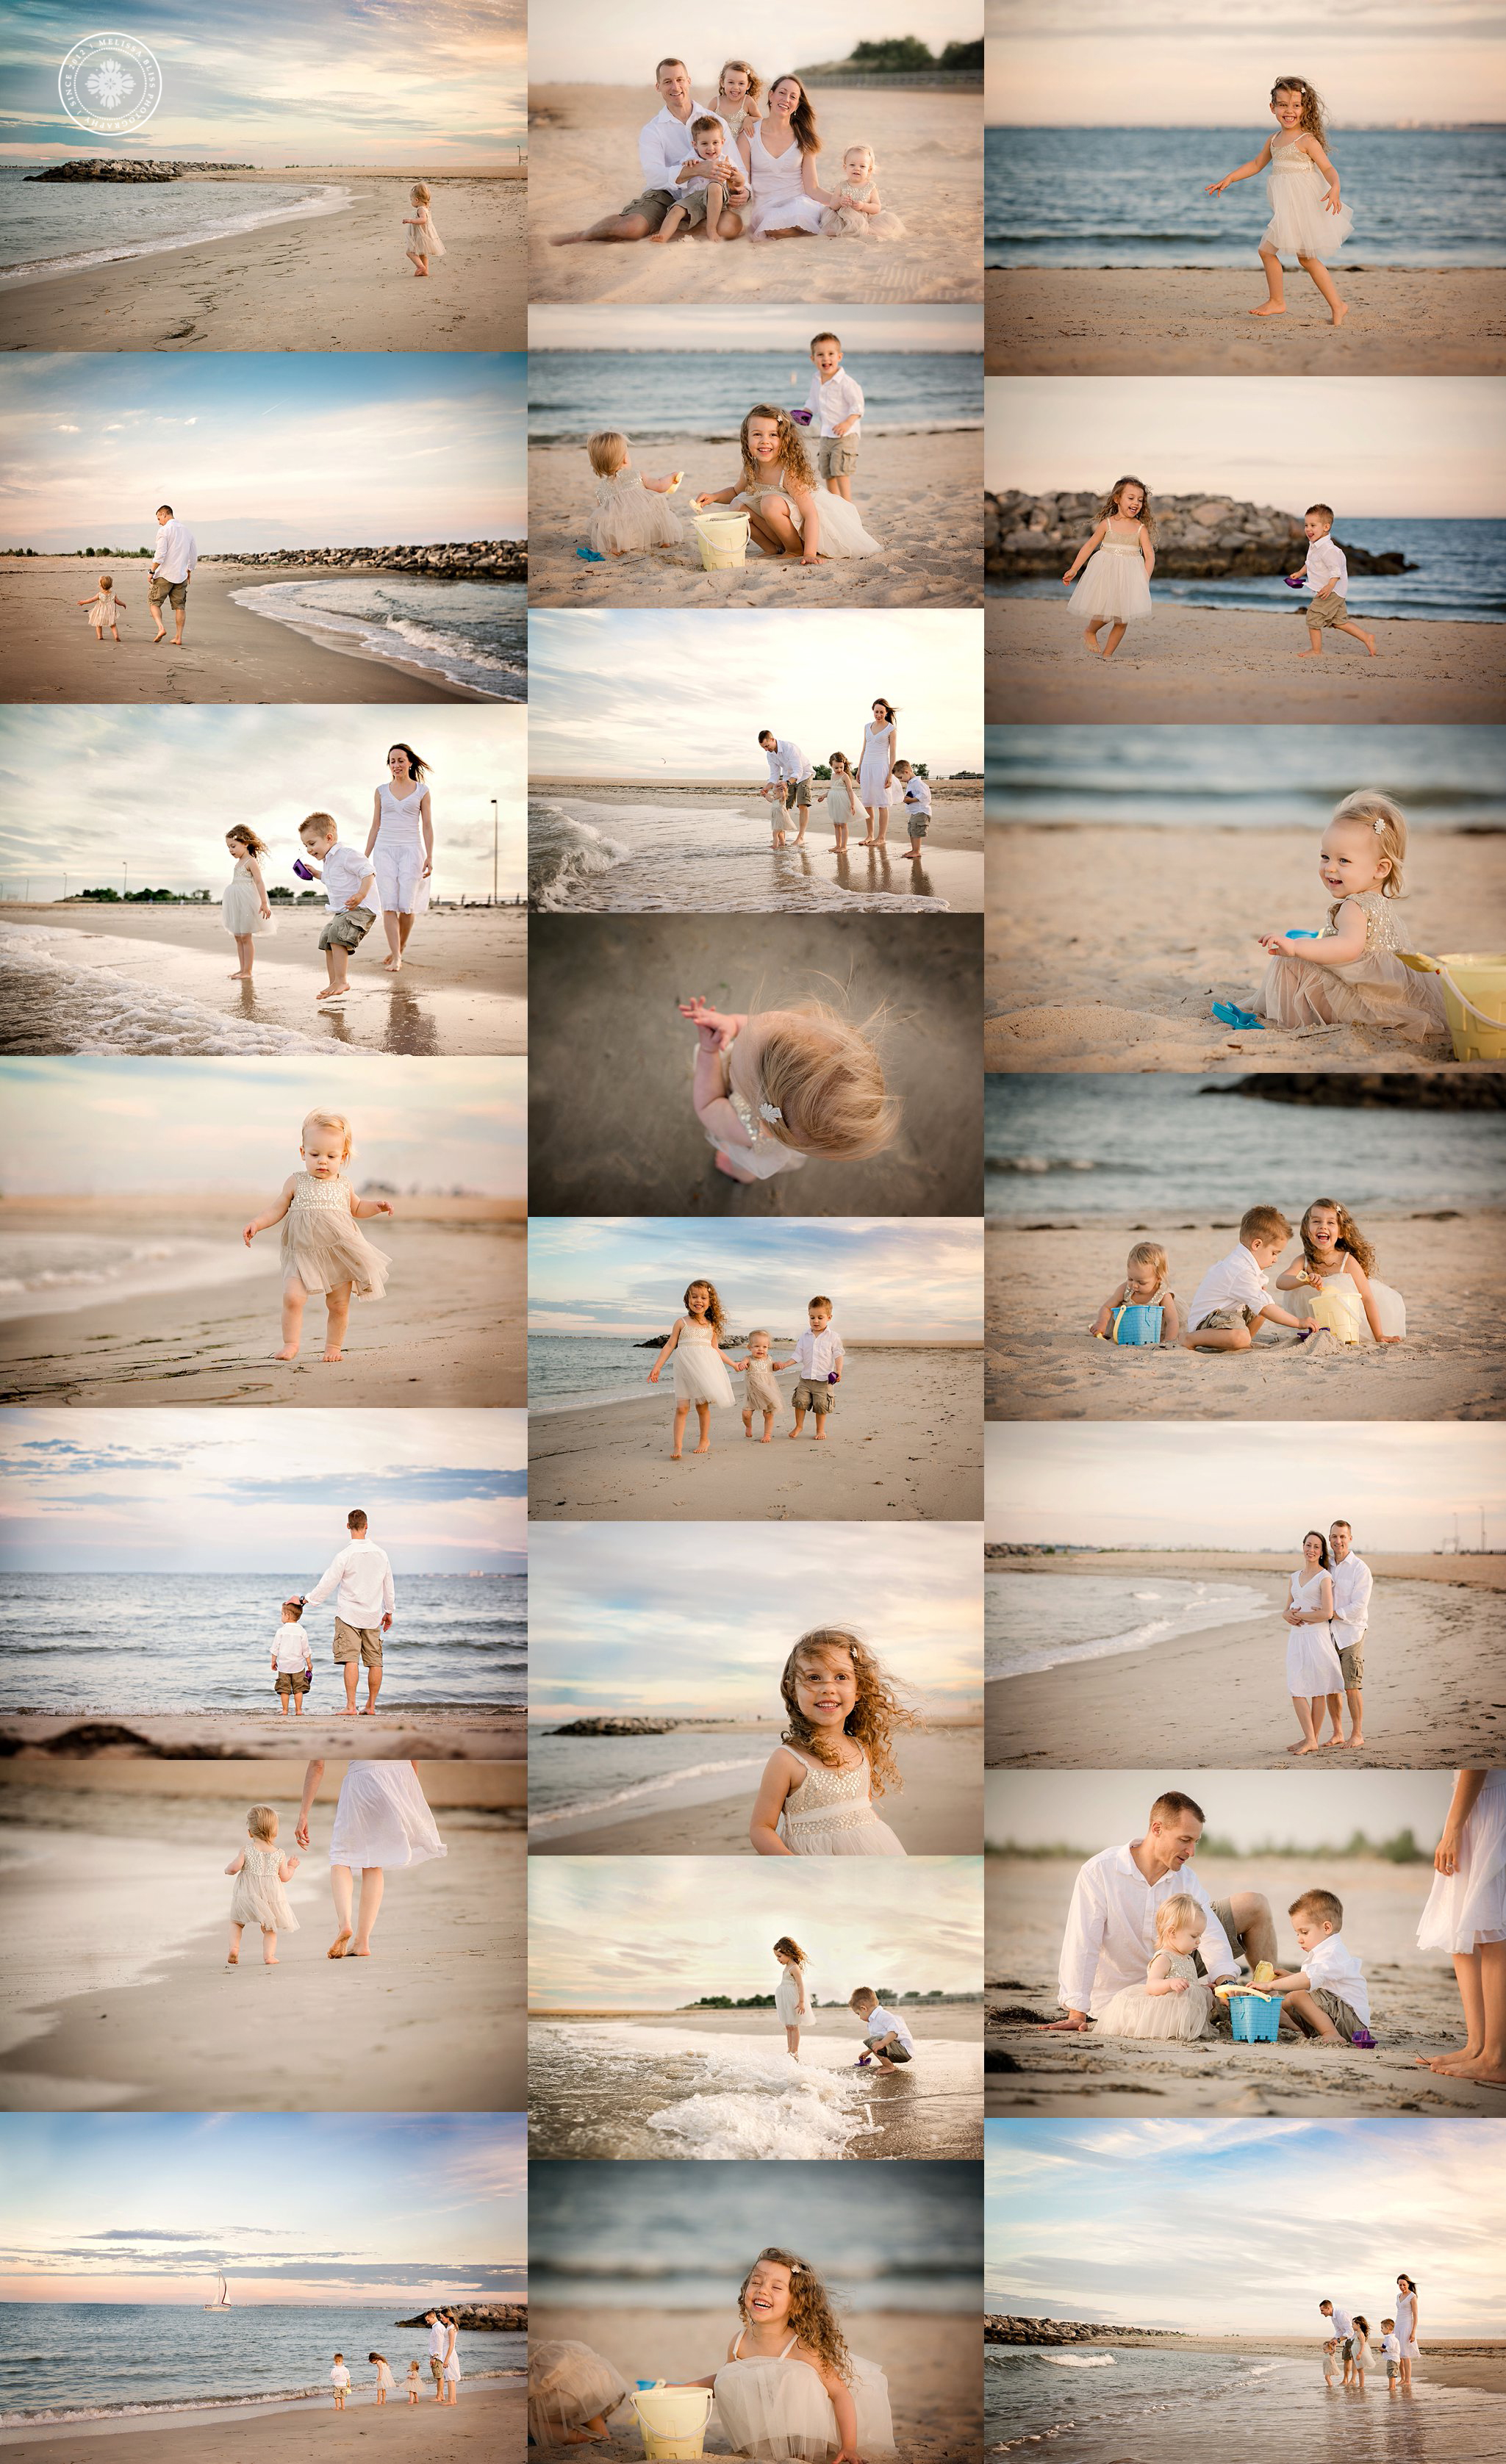 beach-photo-session-family-photography-ideas-seaside-family-session-family-photo-inspiration-sunset-photos-on-the-shore-fort-monroe-meilssa-bliss-photography-virginia-beach-sandbridge-lifestyle-candid-photographers.jpg